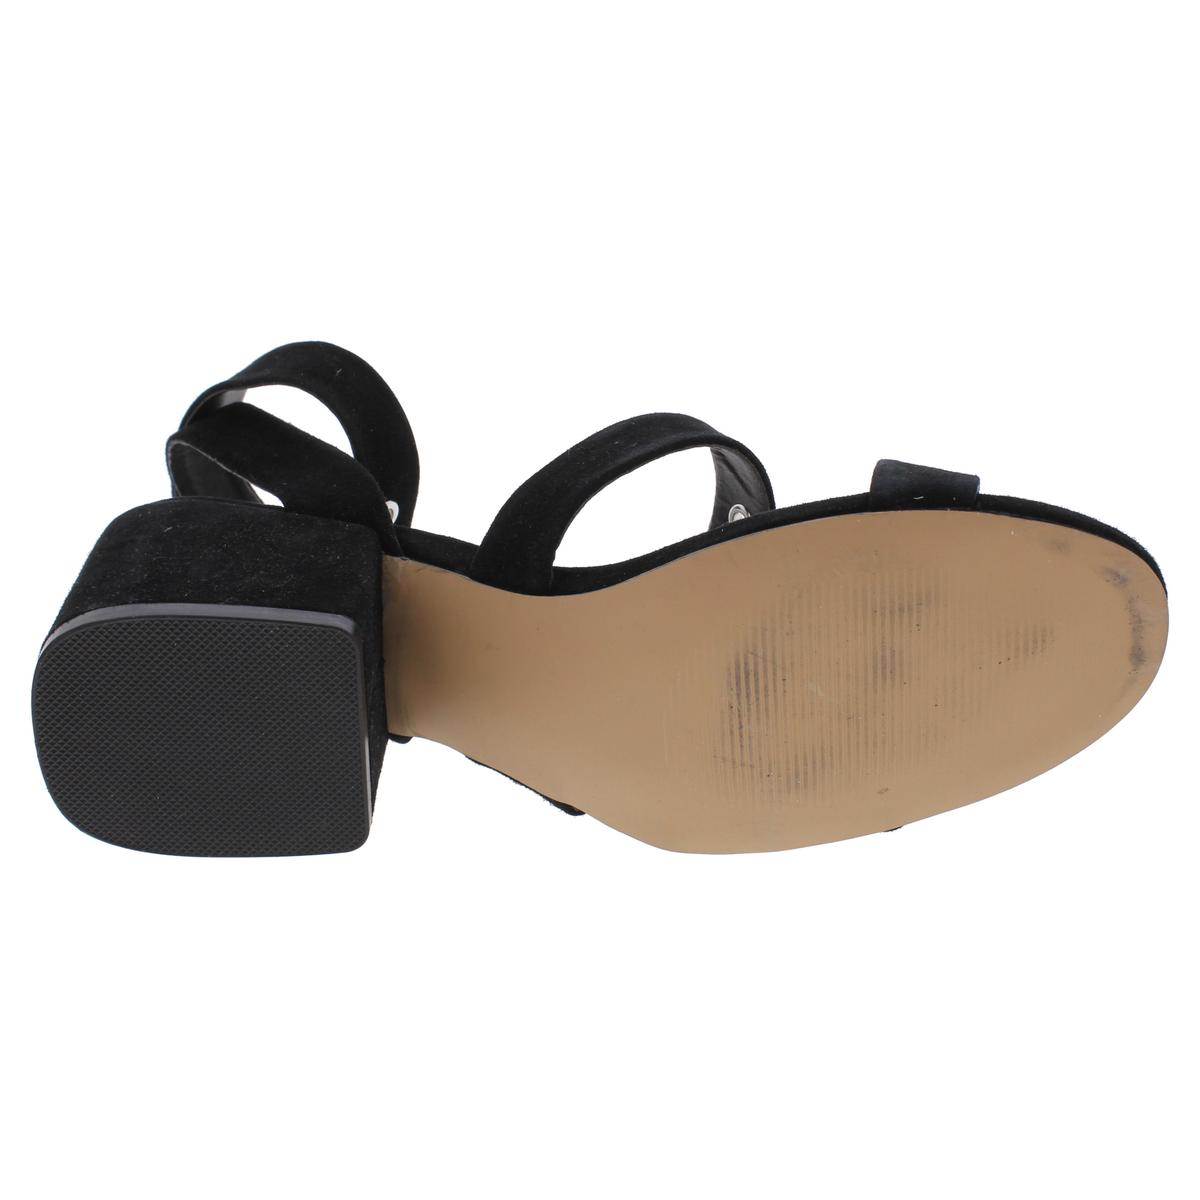 Steve-Madden-Womens-Rotating-Open-Toe-Double-Strap-Dress-Sandals-Shoes-BHFO-4421 thumbnail 8